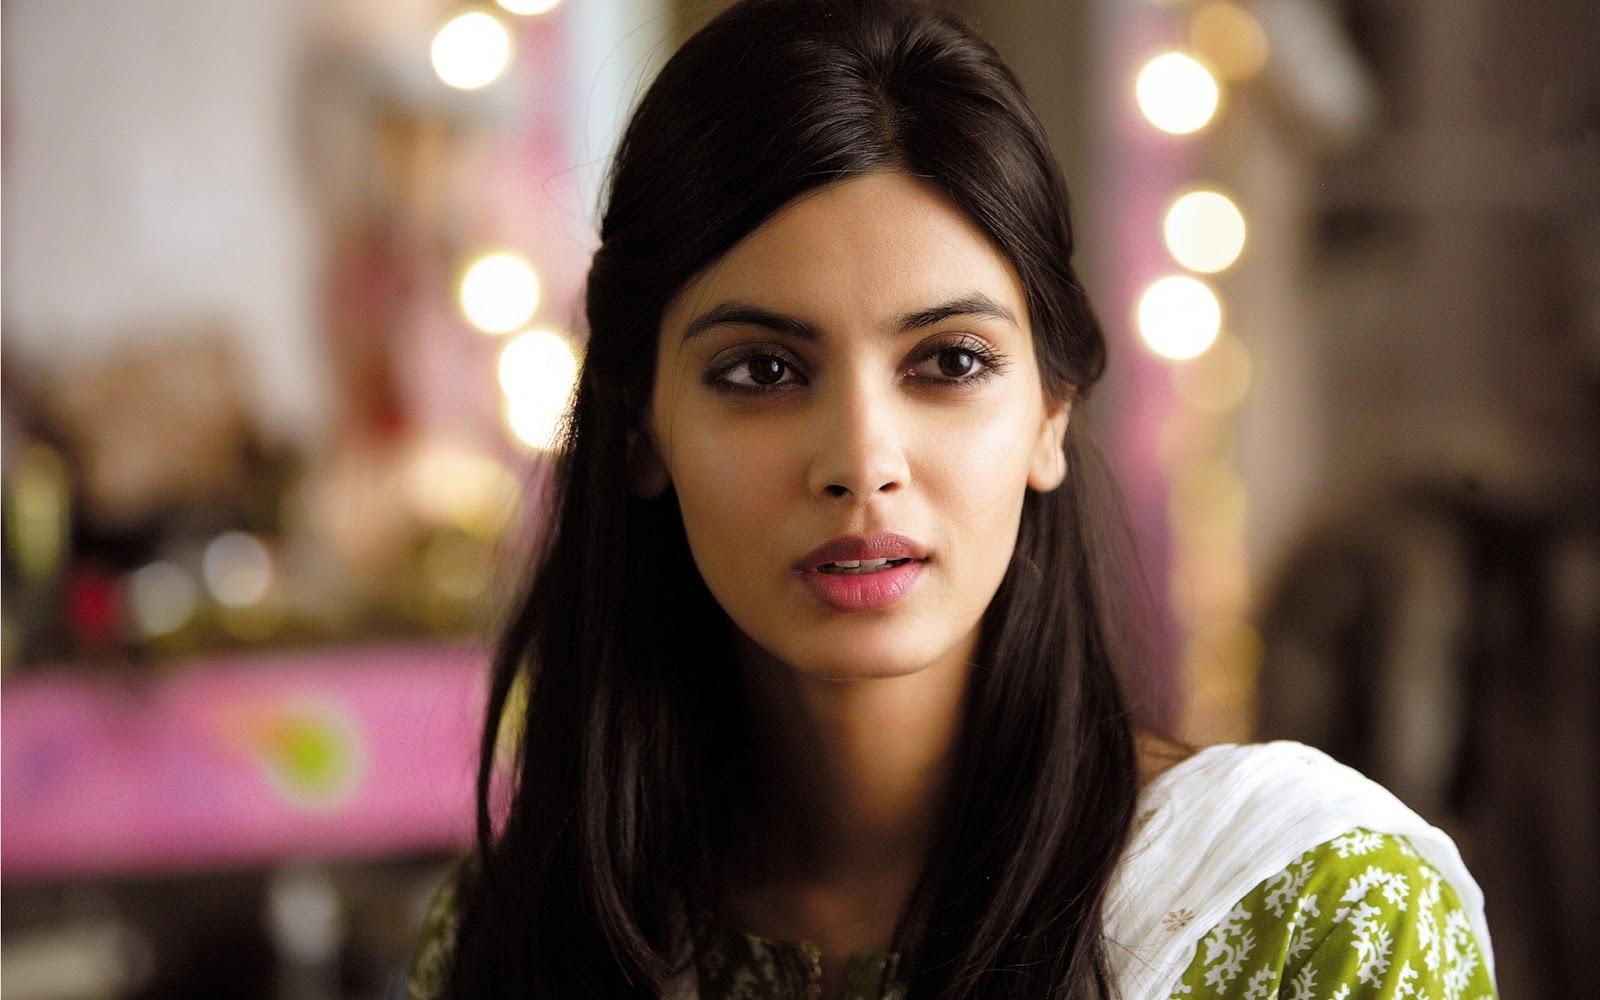 Hd wallpaper bollywood - Diana Penty New Bollywood Actress Hd Desktop Wallpaper Wallpapers